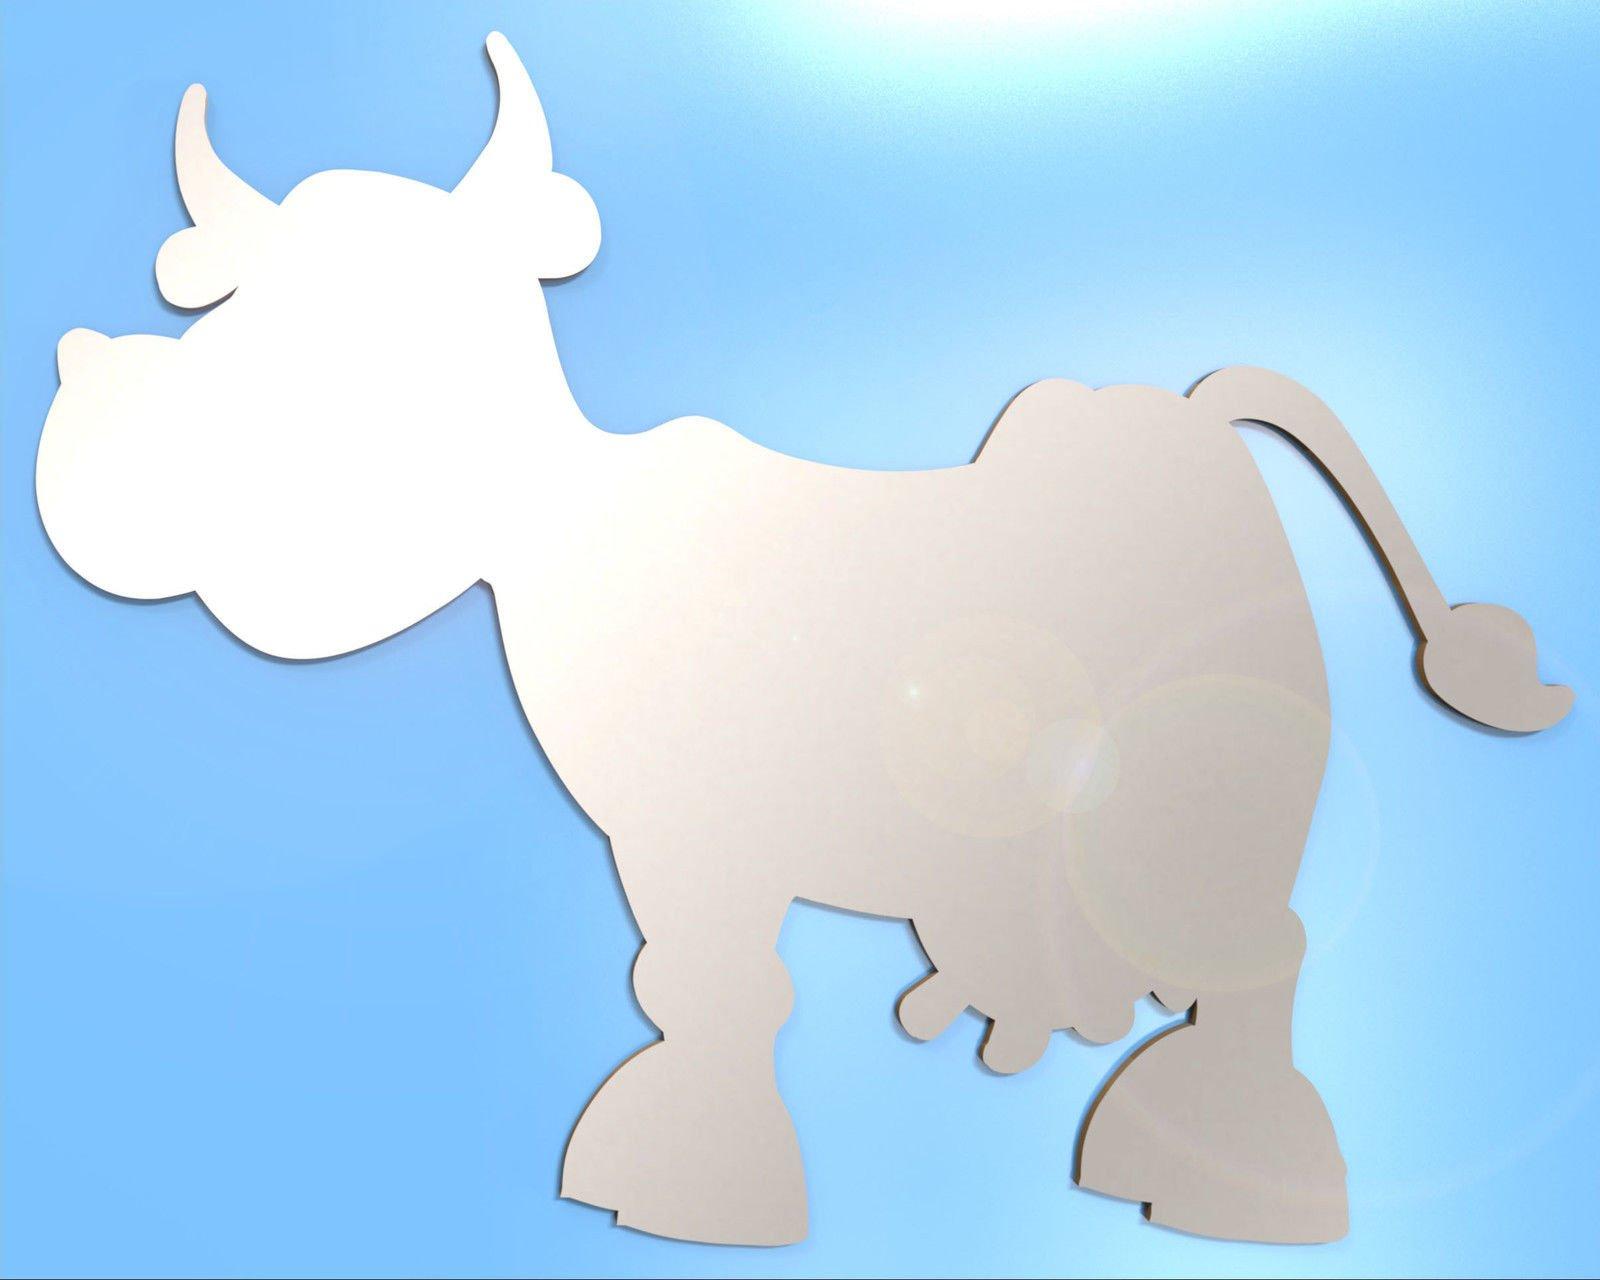 Wall Mirror Bathroom Mirror Any Room Cartoon Cow Cows Animal Farm 15cm 35cm 50cm Acrylic Mirror NO NAILS NO DRILL Needed 35cm x 28cm